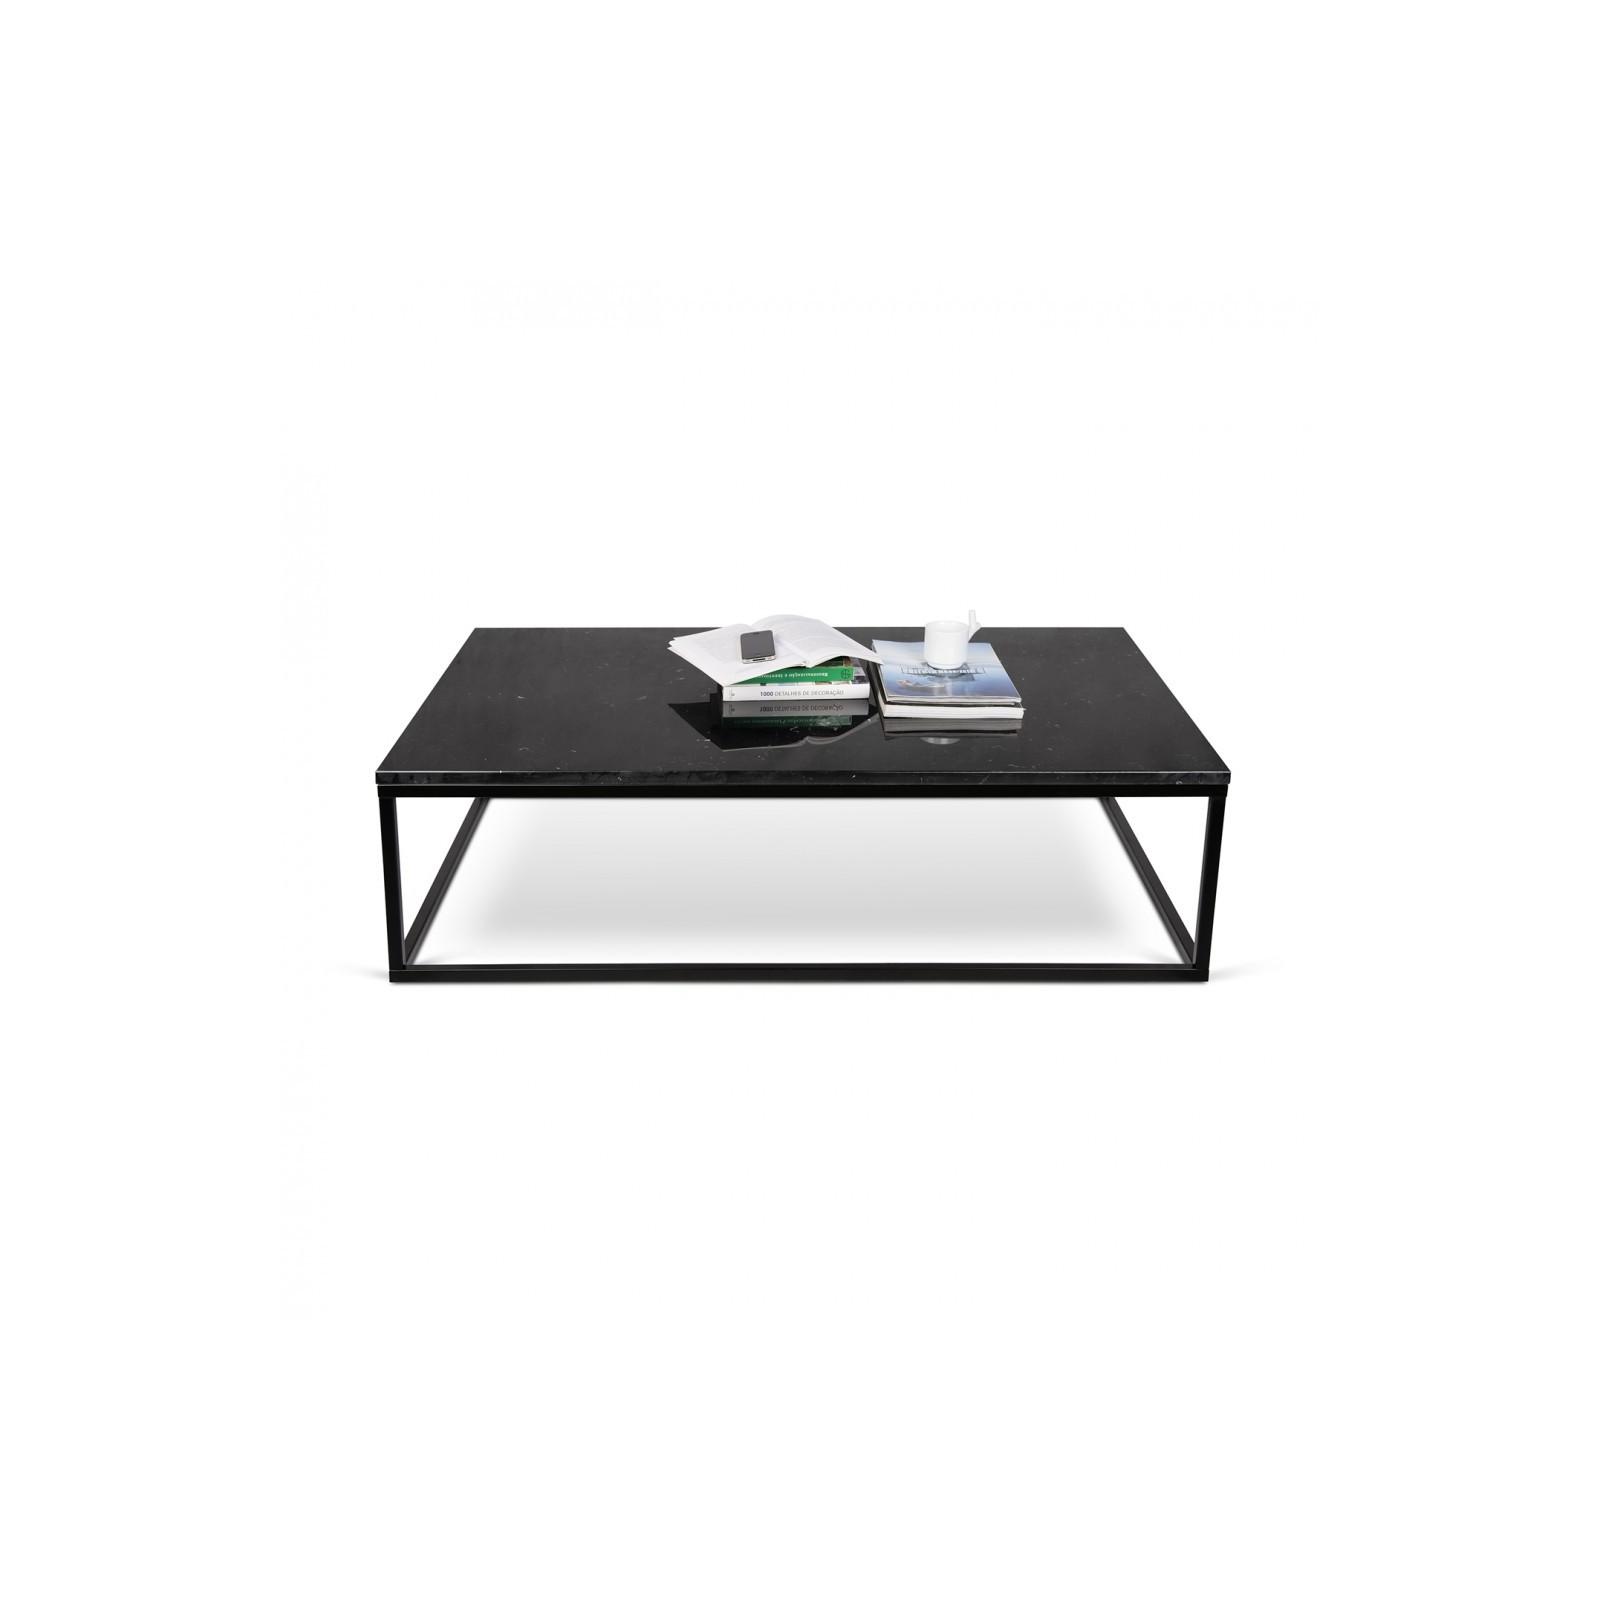 c7bd6e4edd244 ... La véritable table-basse marbre noir & chrome ...